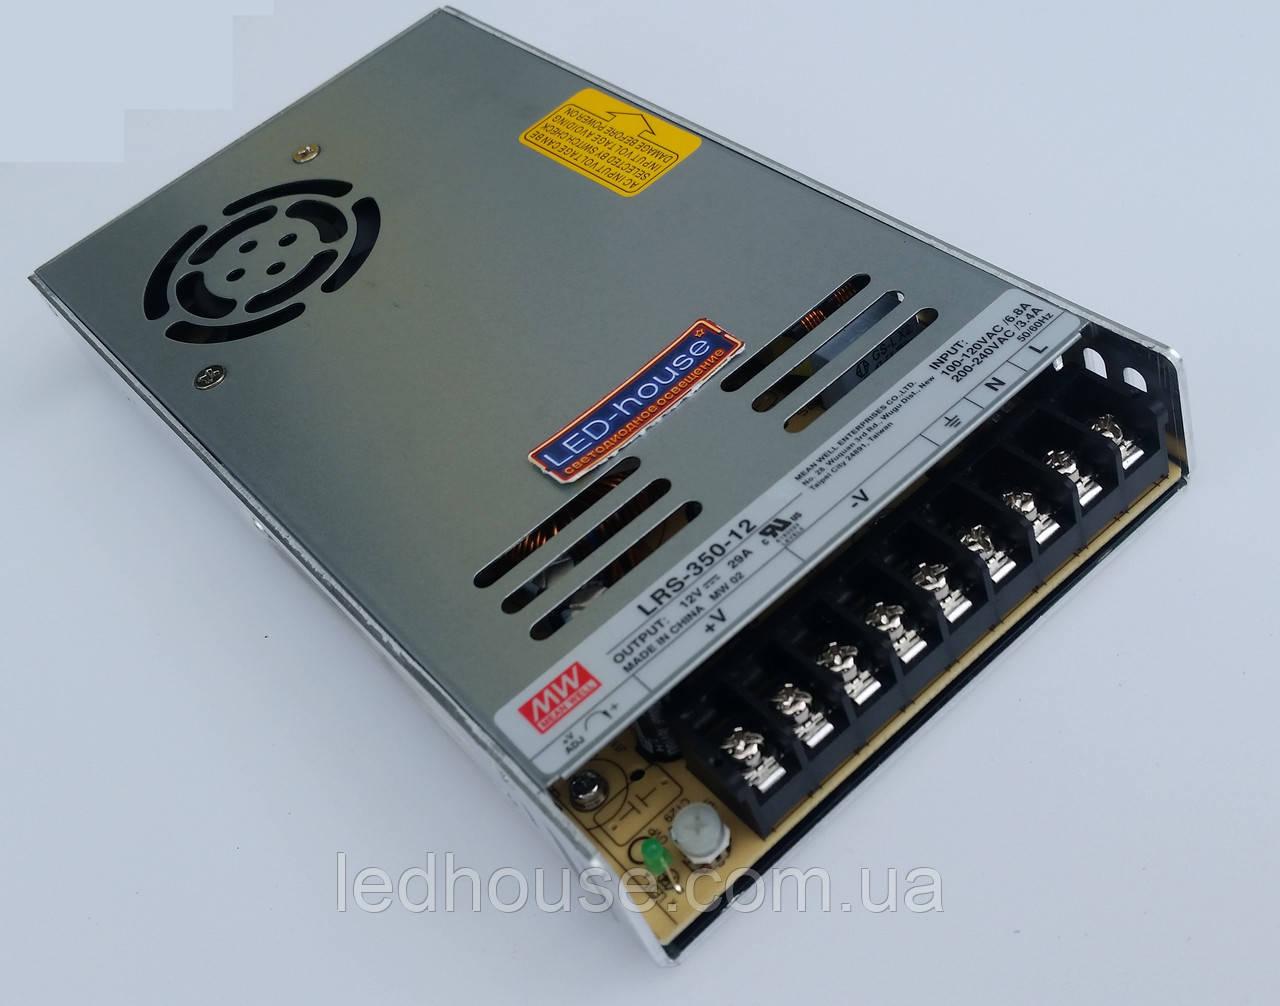 Источник питания Mean Well LRS-350-12V,(Минвел)